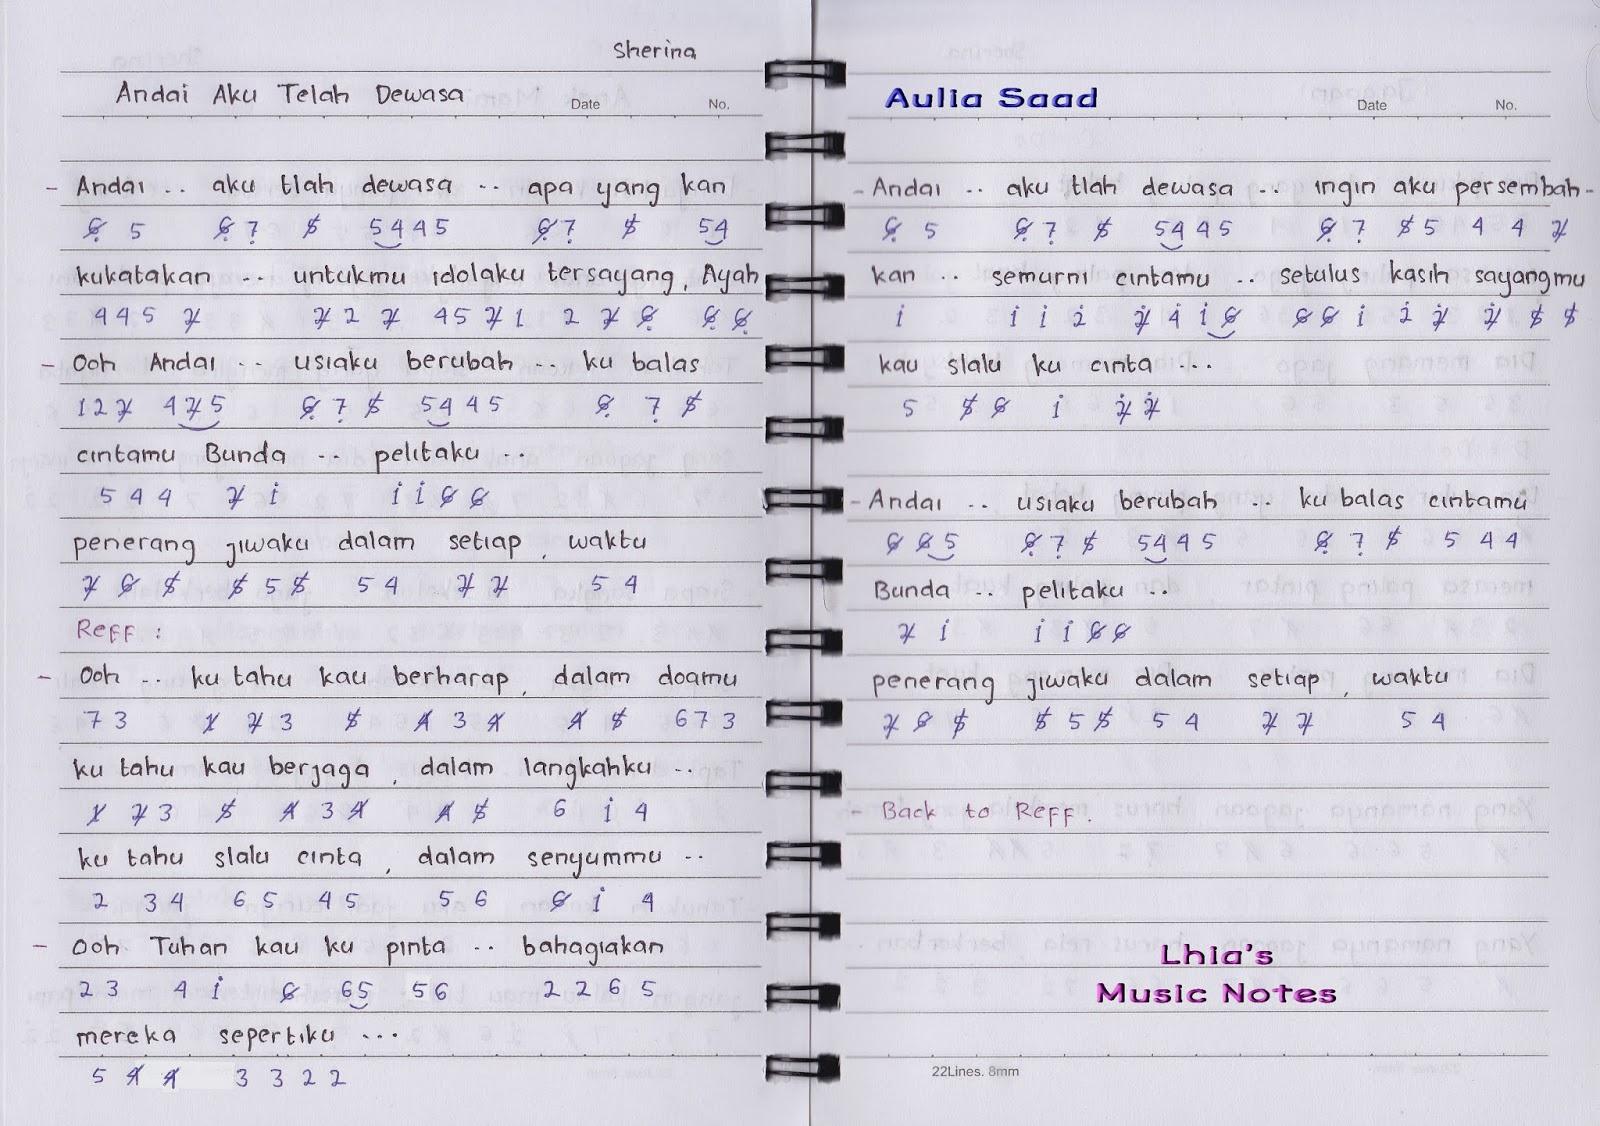 Not Angka : Sherina – Andai Aku Telah Dewasa | Lhia's Music Notes